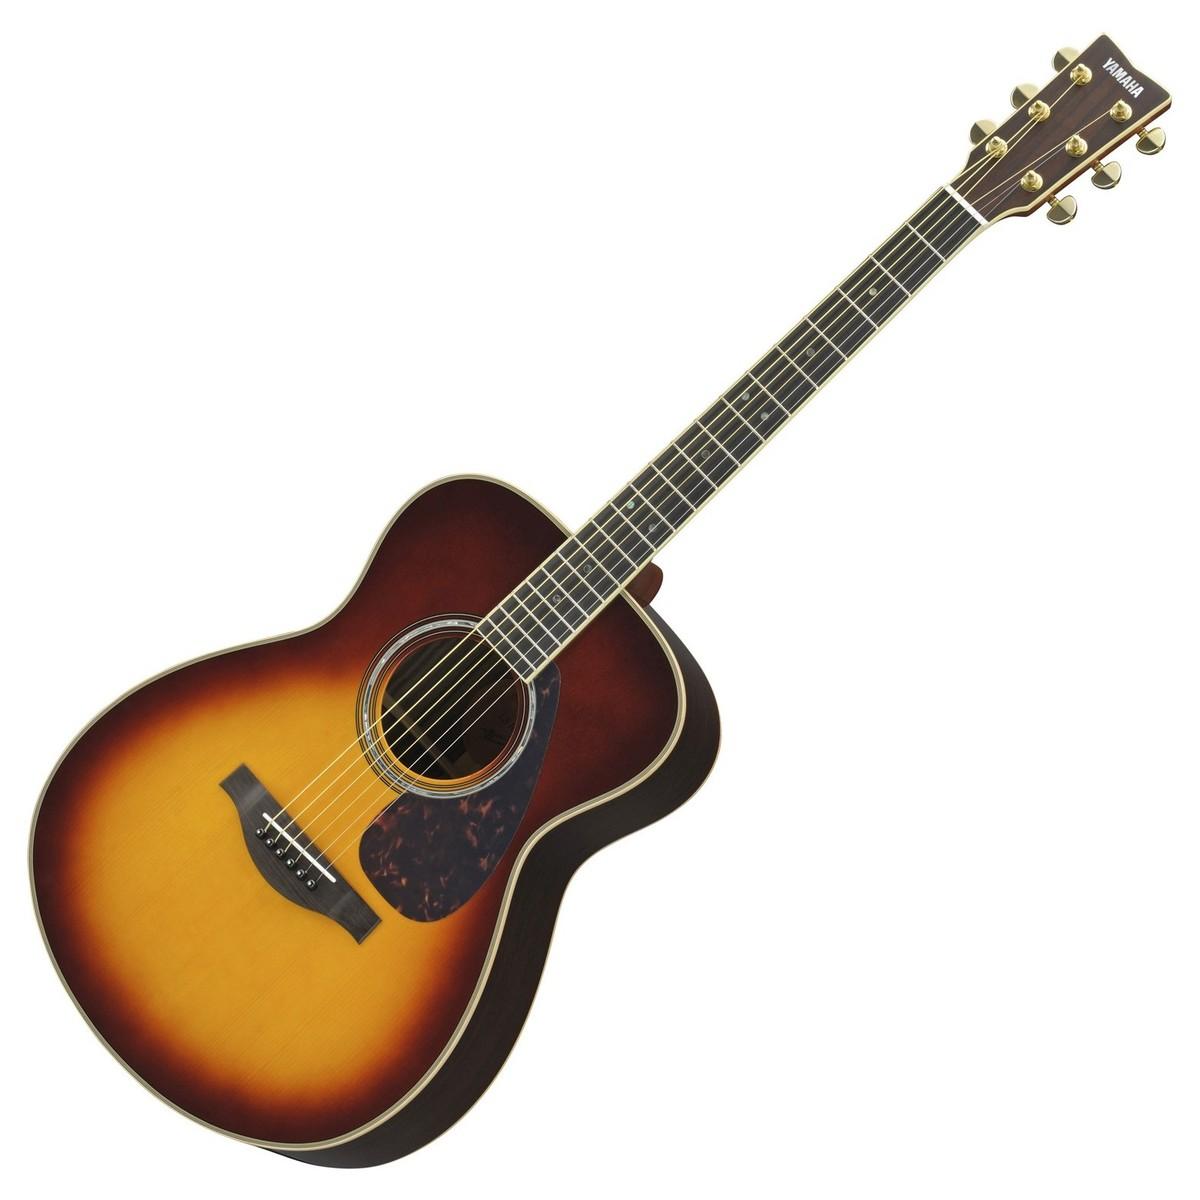 yamaha ls16are guitare acoustique sunburst. Black Bedroom Furniture Sets. Home Design Ideas